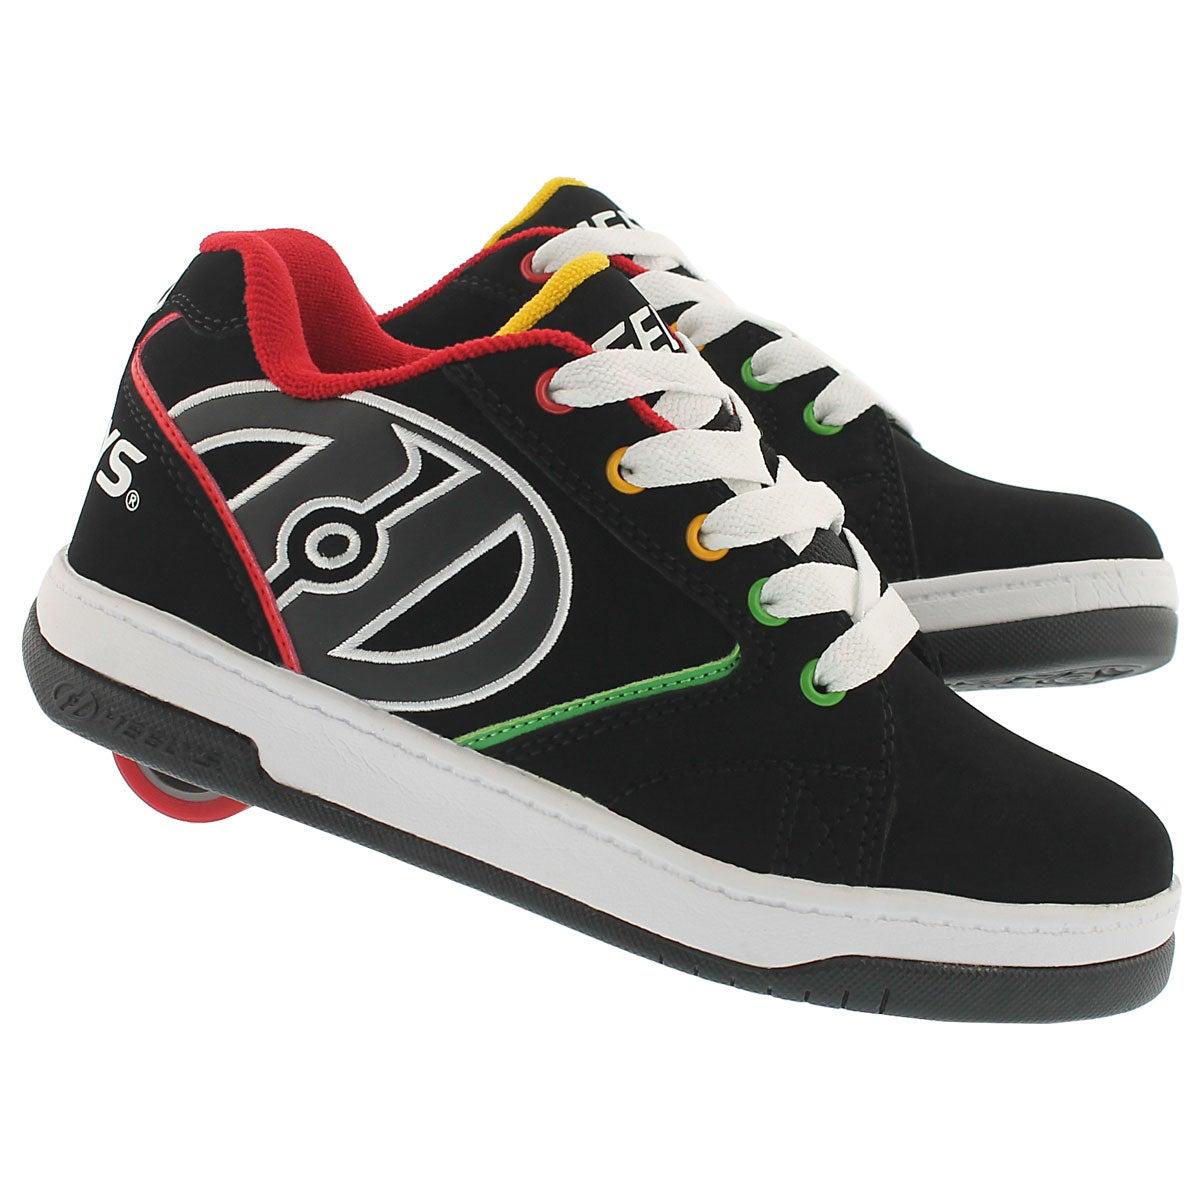 Bys Propel 2.0 blk/multi skate sneaker